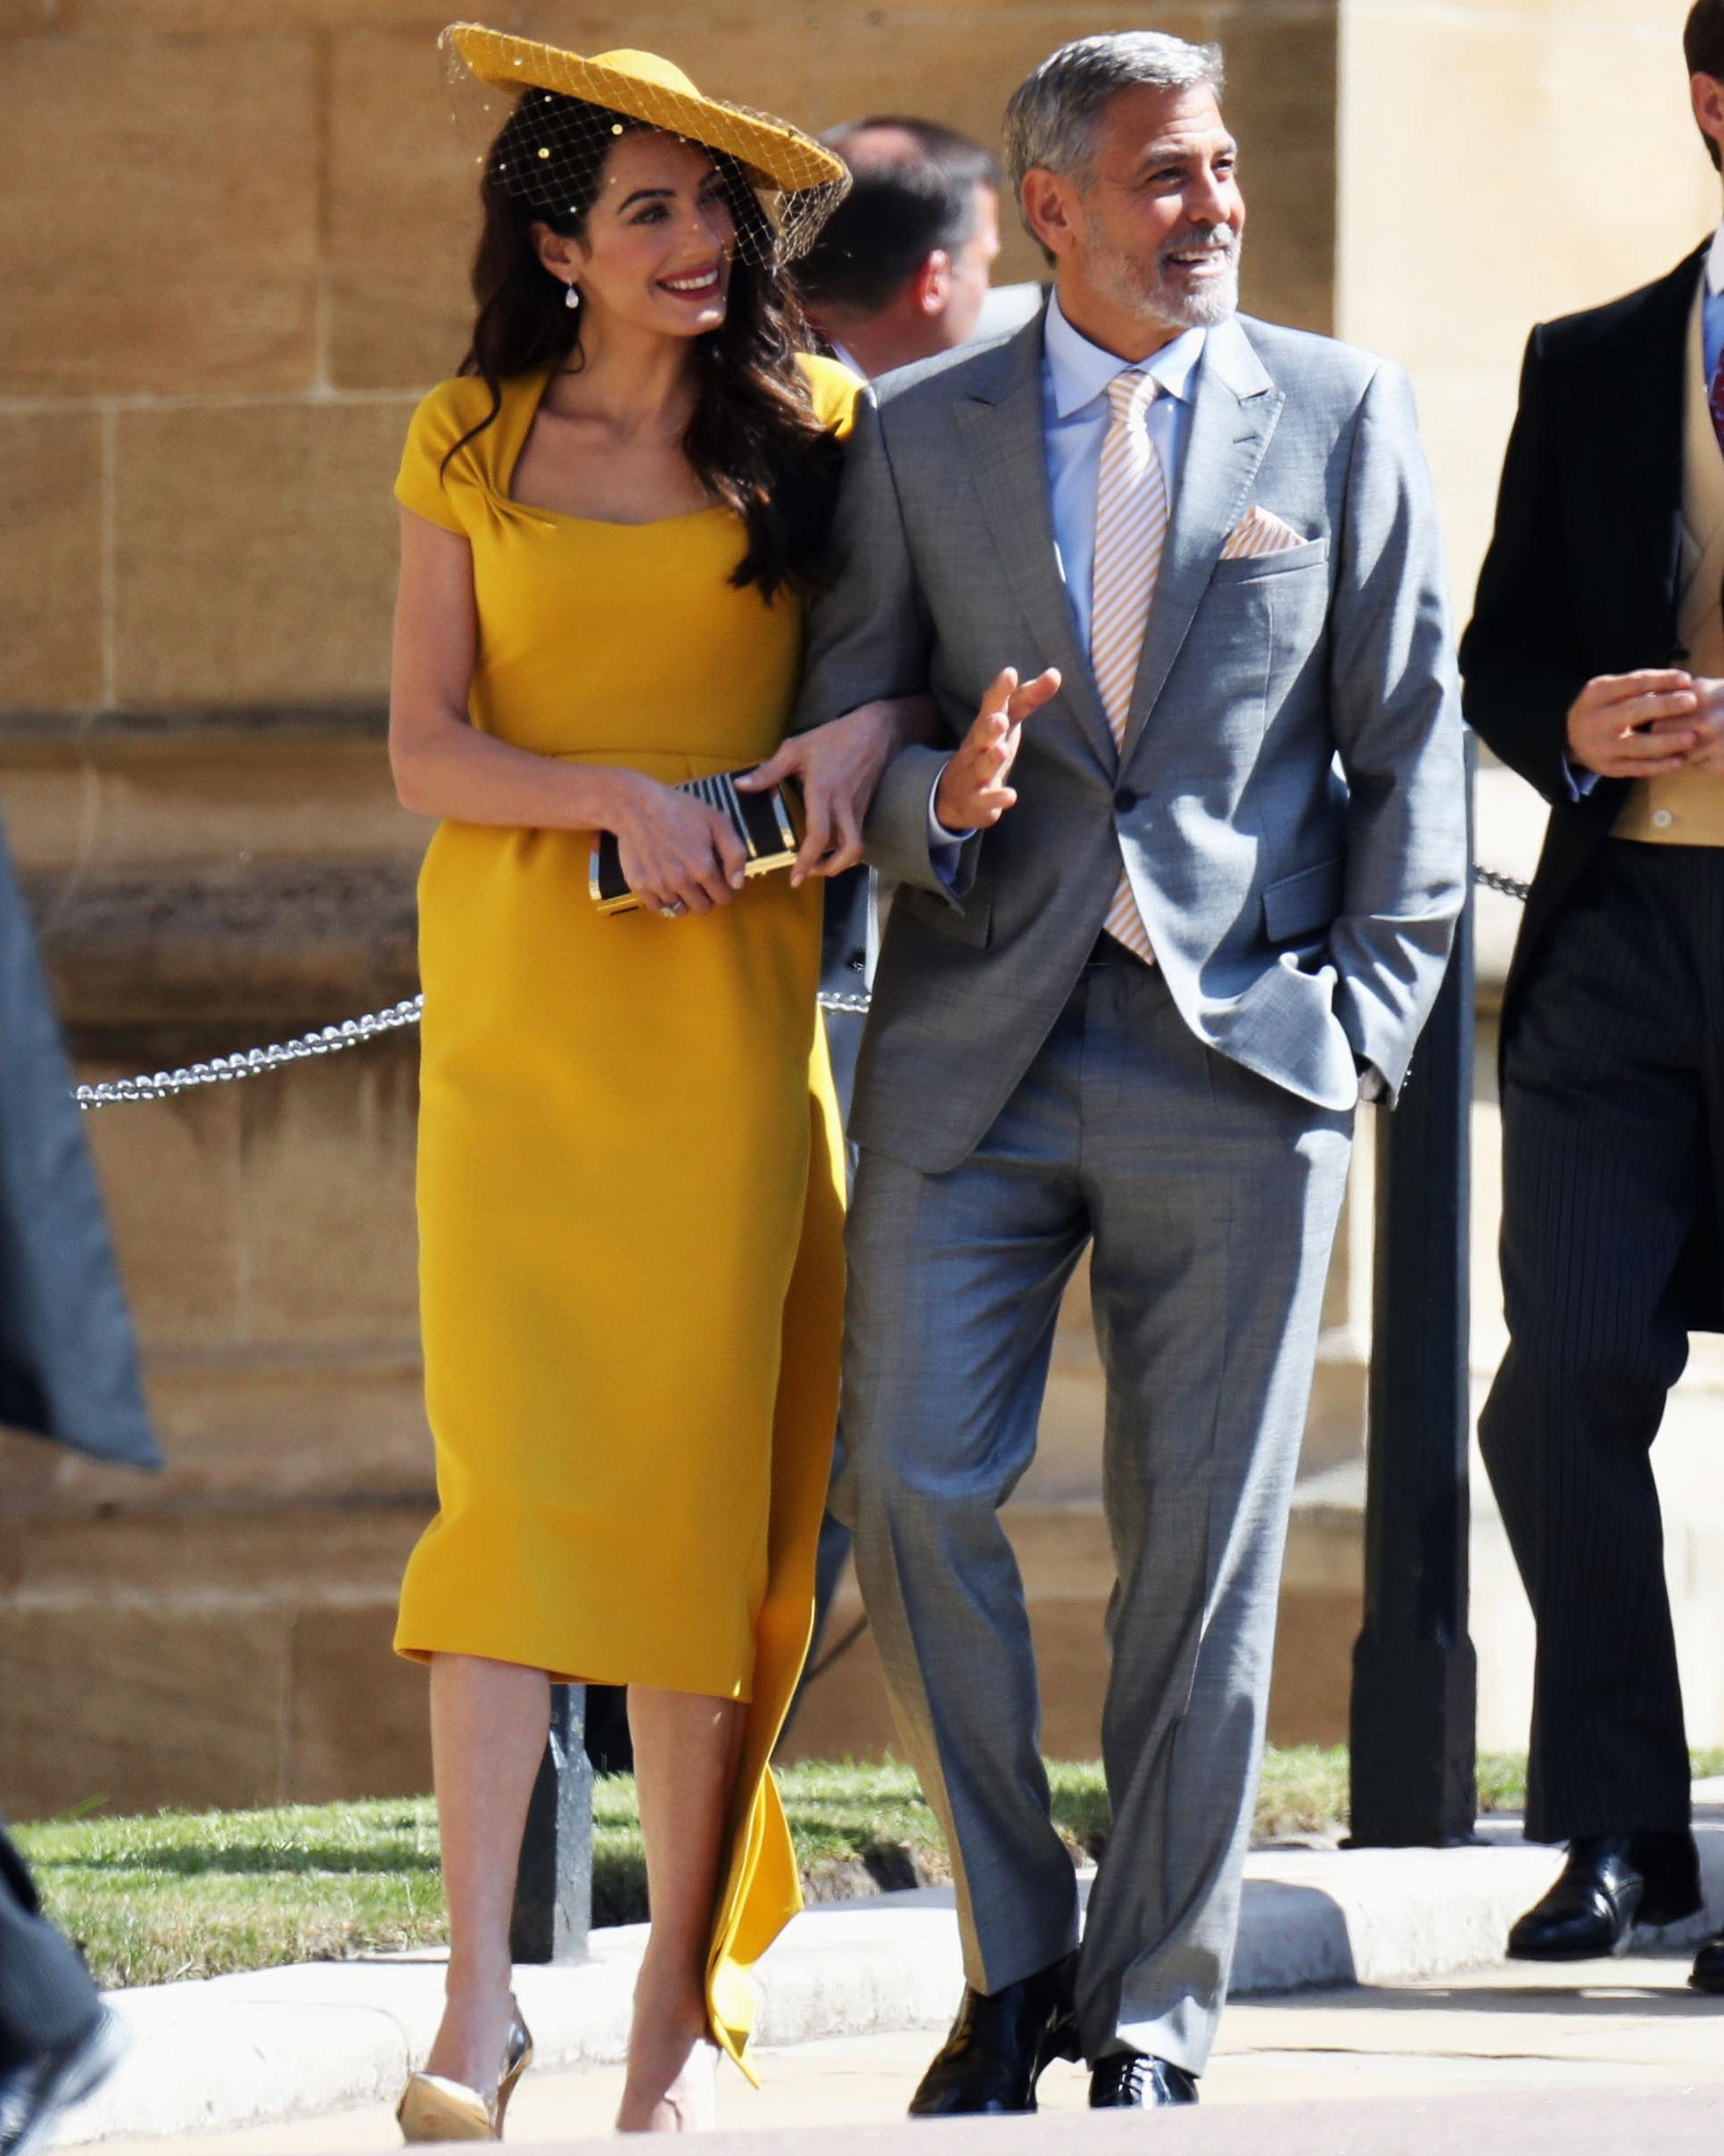 Oprah At Prince Harry Wedding.Royal Wedding Celebrity Guest Arrivals Include Suits Stars Oprah